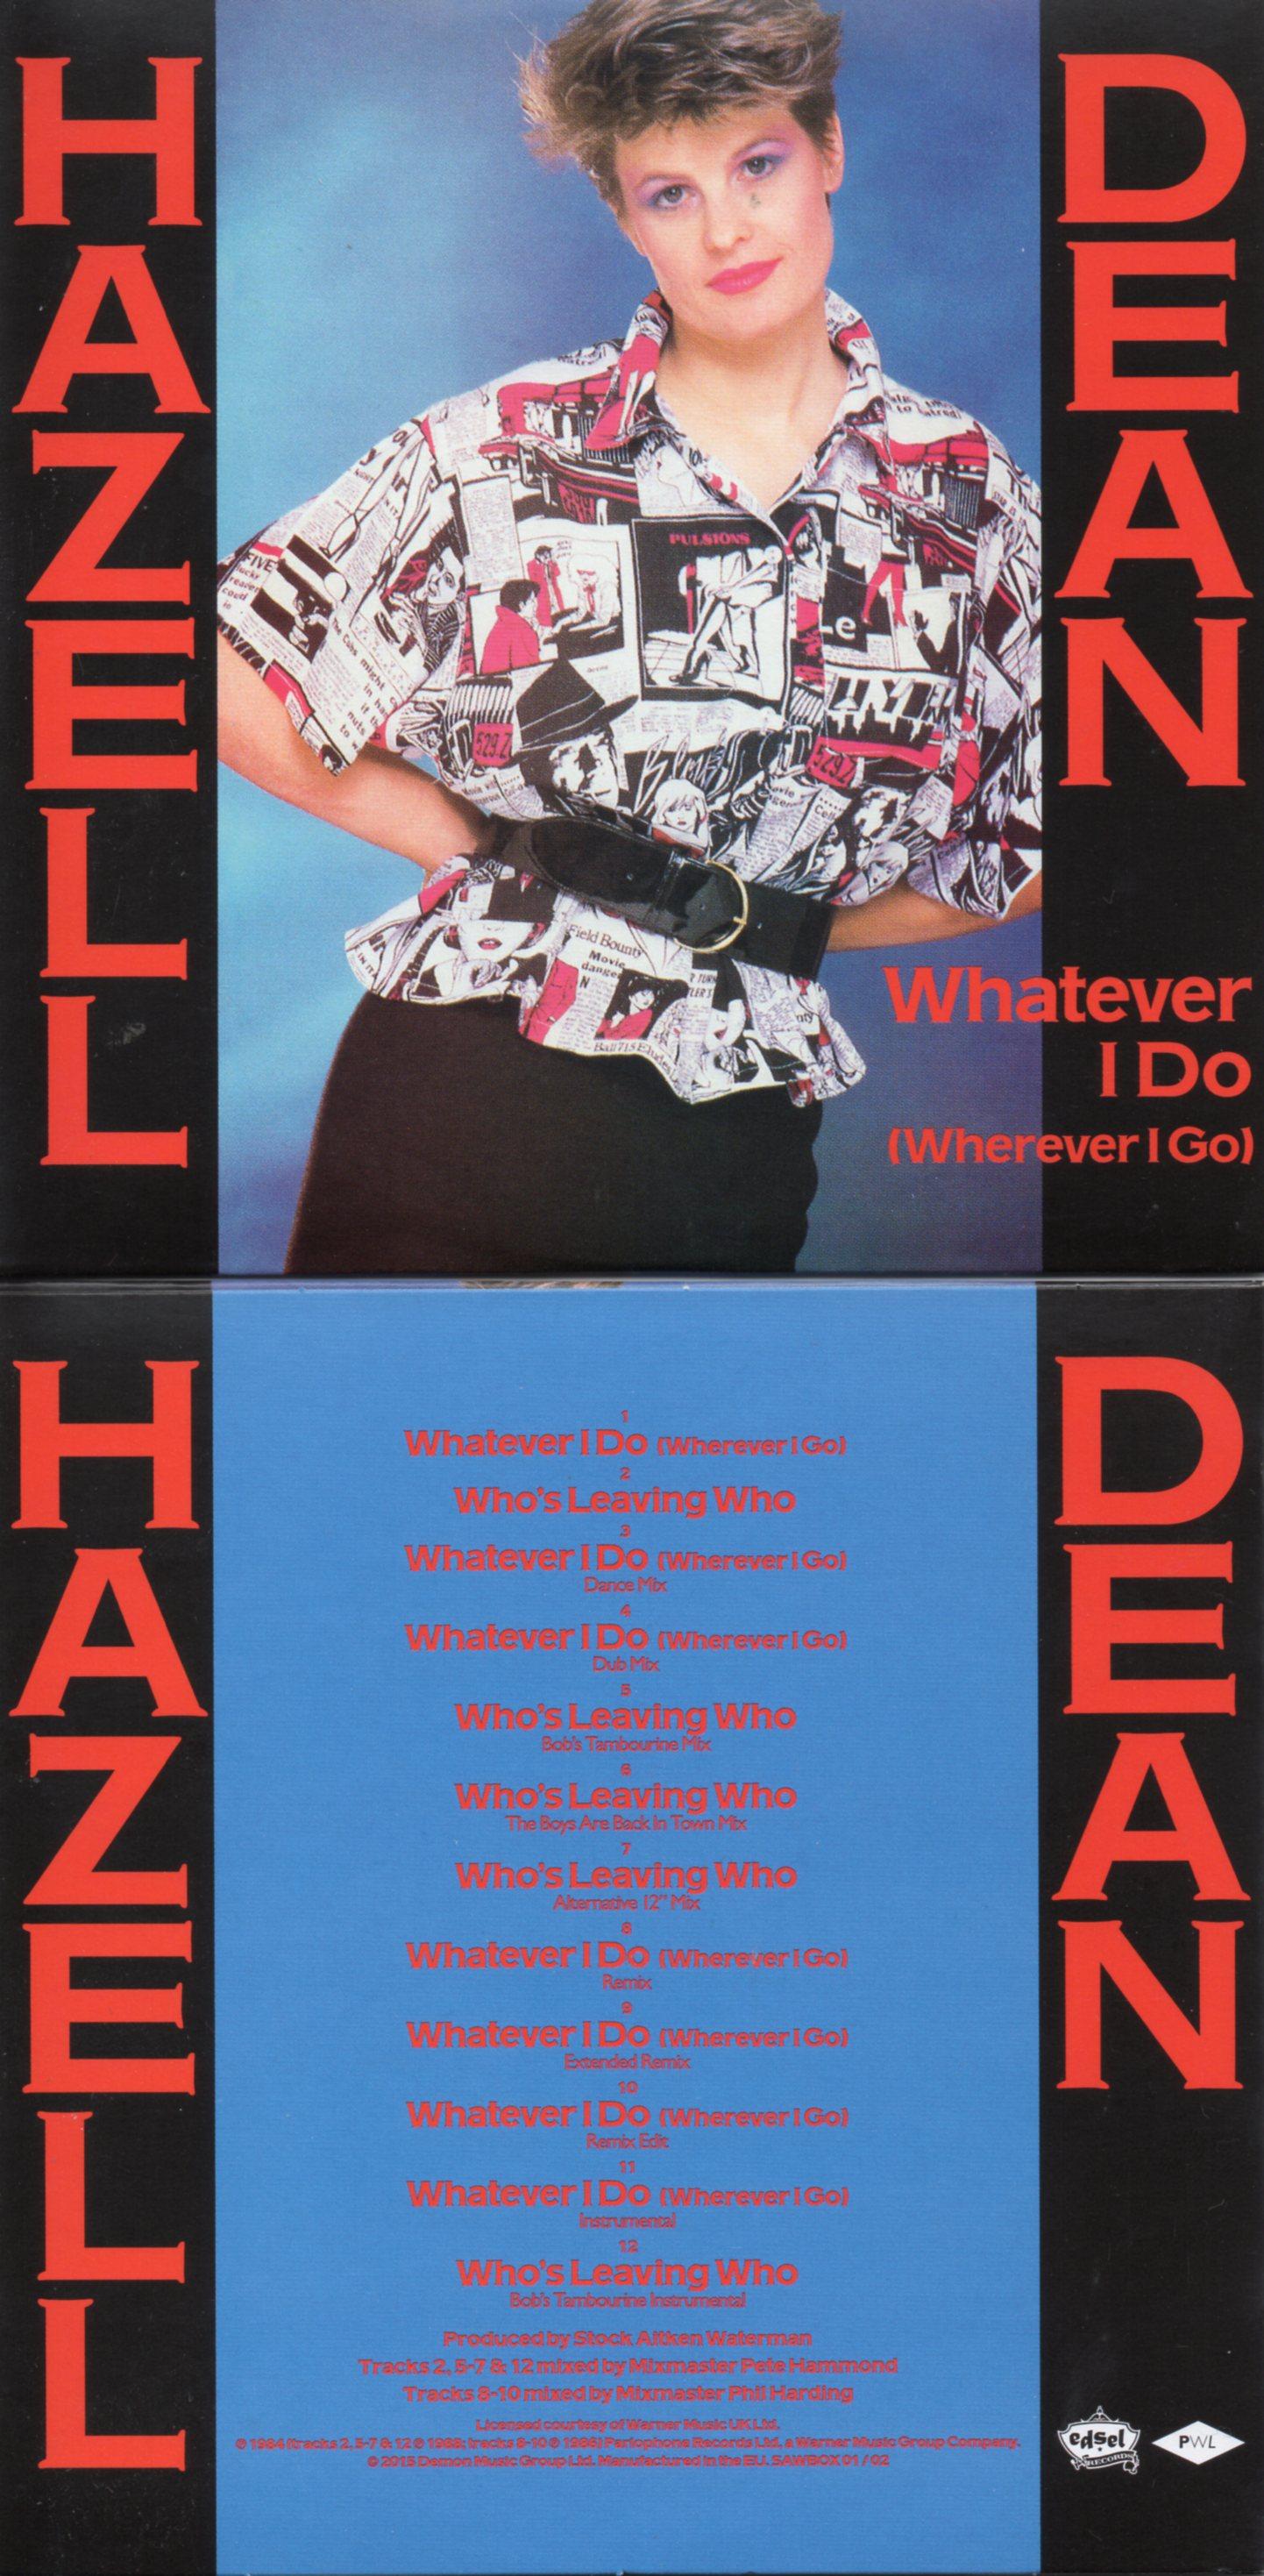 HAZELL DEAN - STOCK AITKEN WATERMAN - PWL - Whatever I Do (Wherever I Go) / Who's Leaving Who 12-track CARD SLEEVE REMIXES - CD single